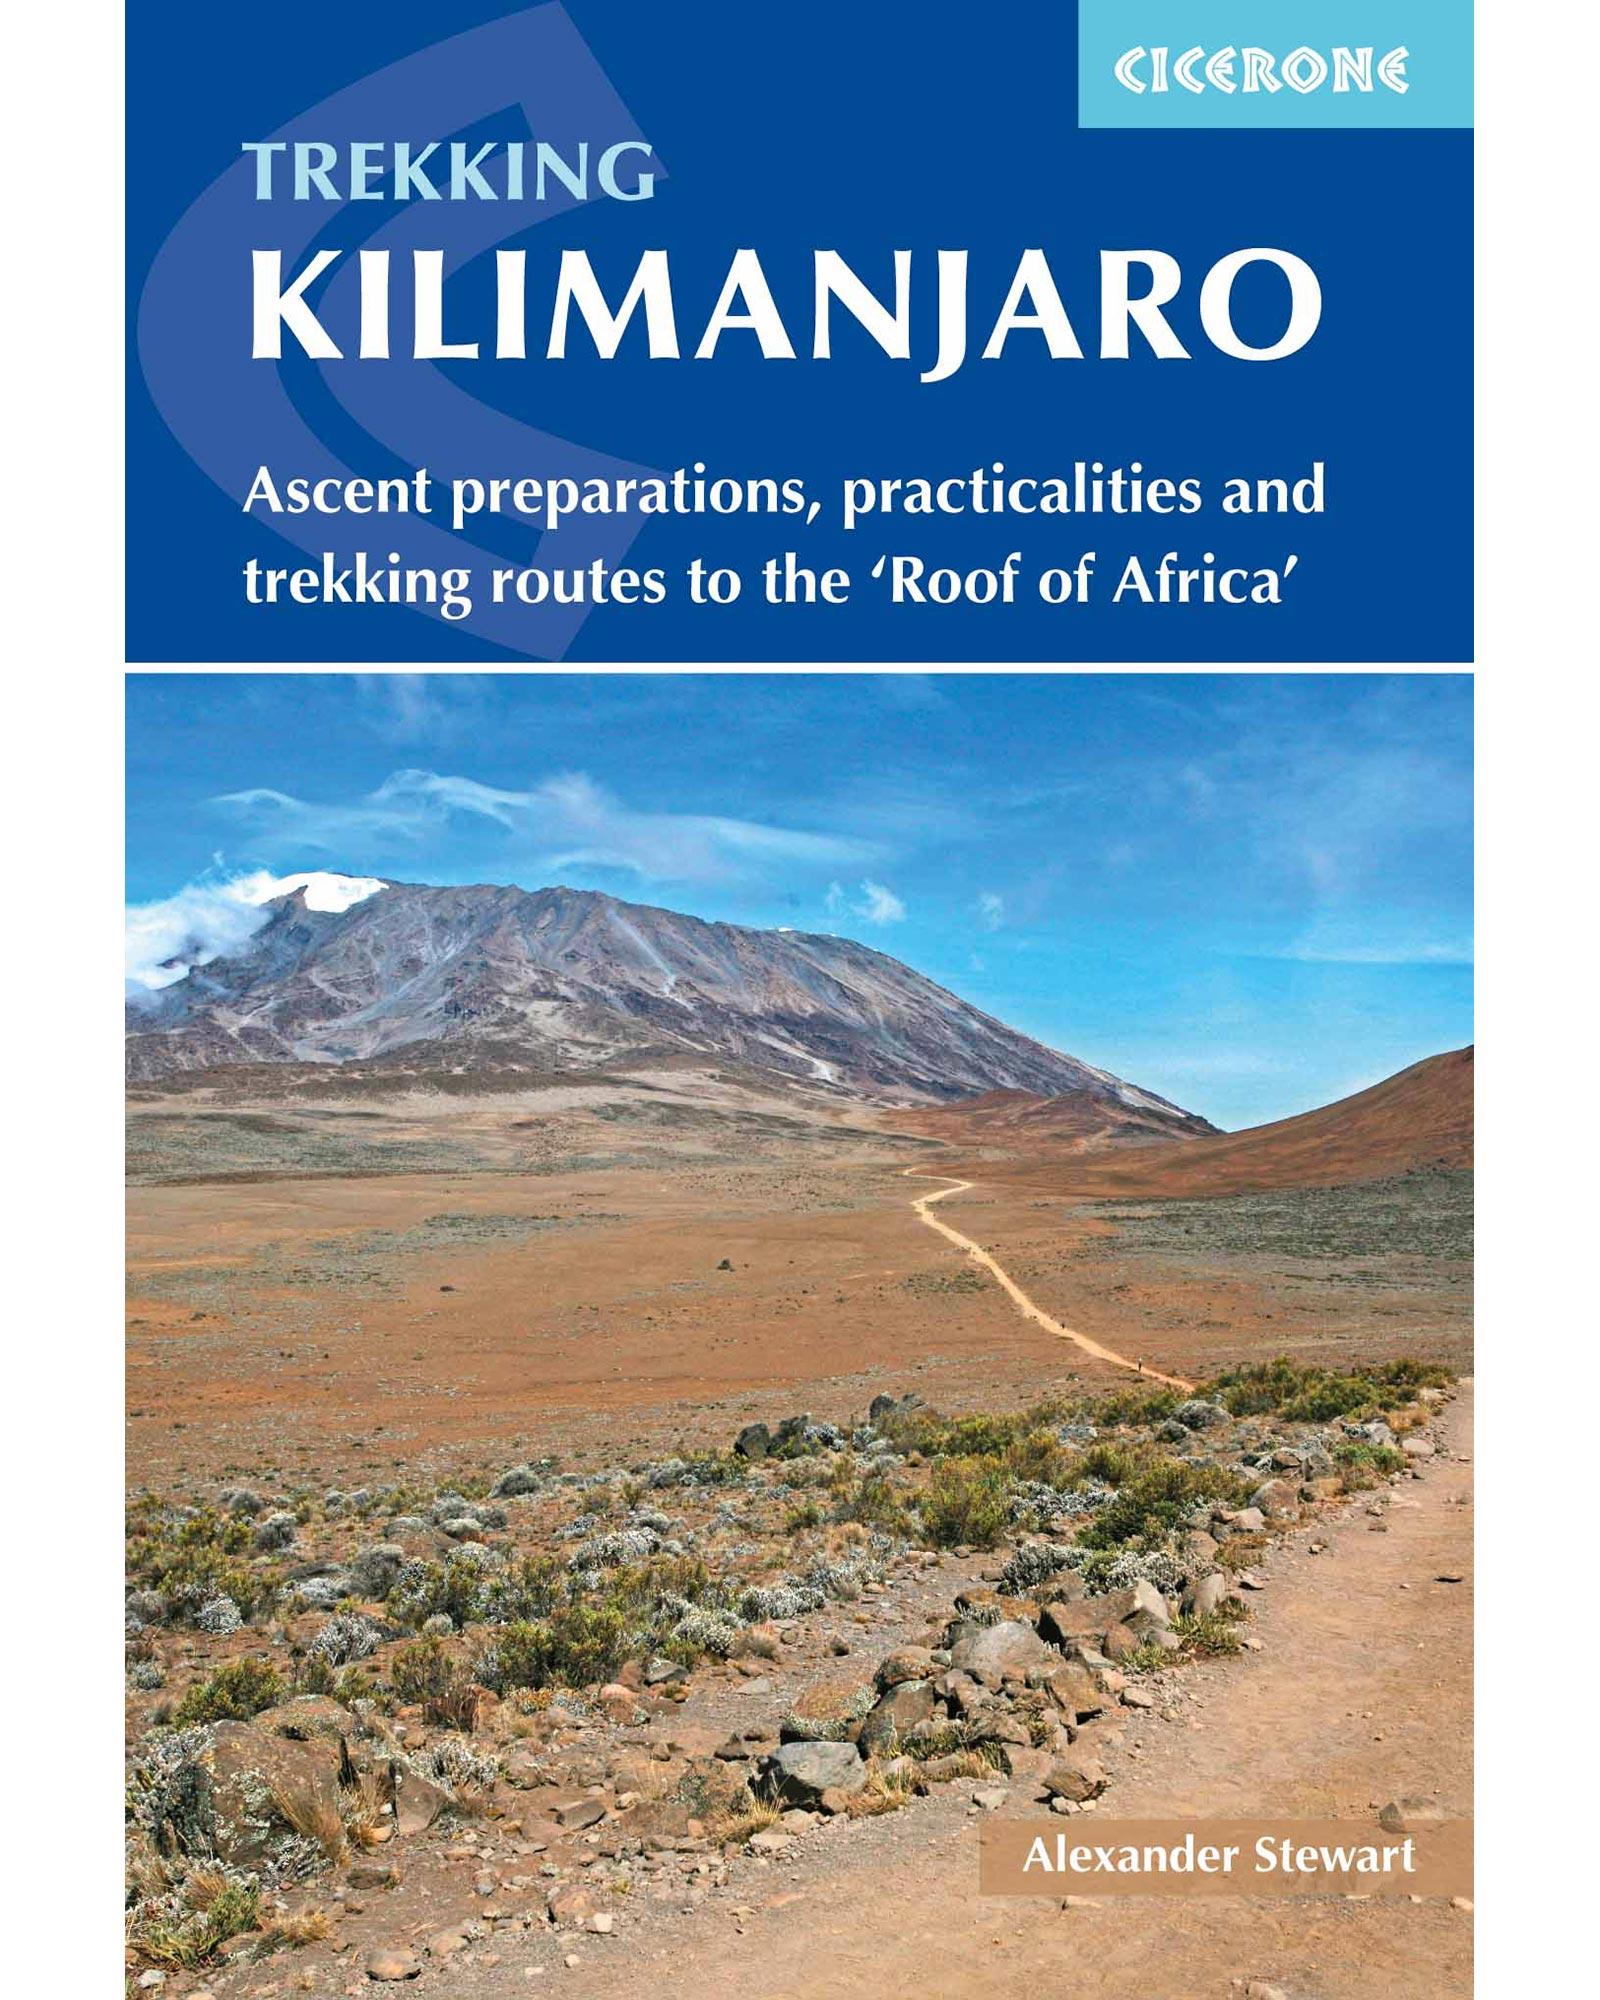 Cicerone Kilimanjaro: A Complete Trekker's Guide 0